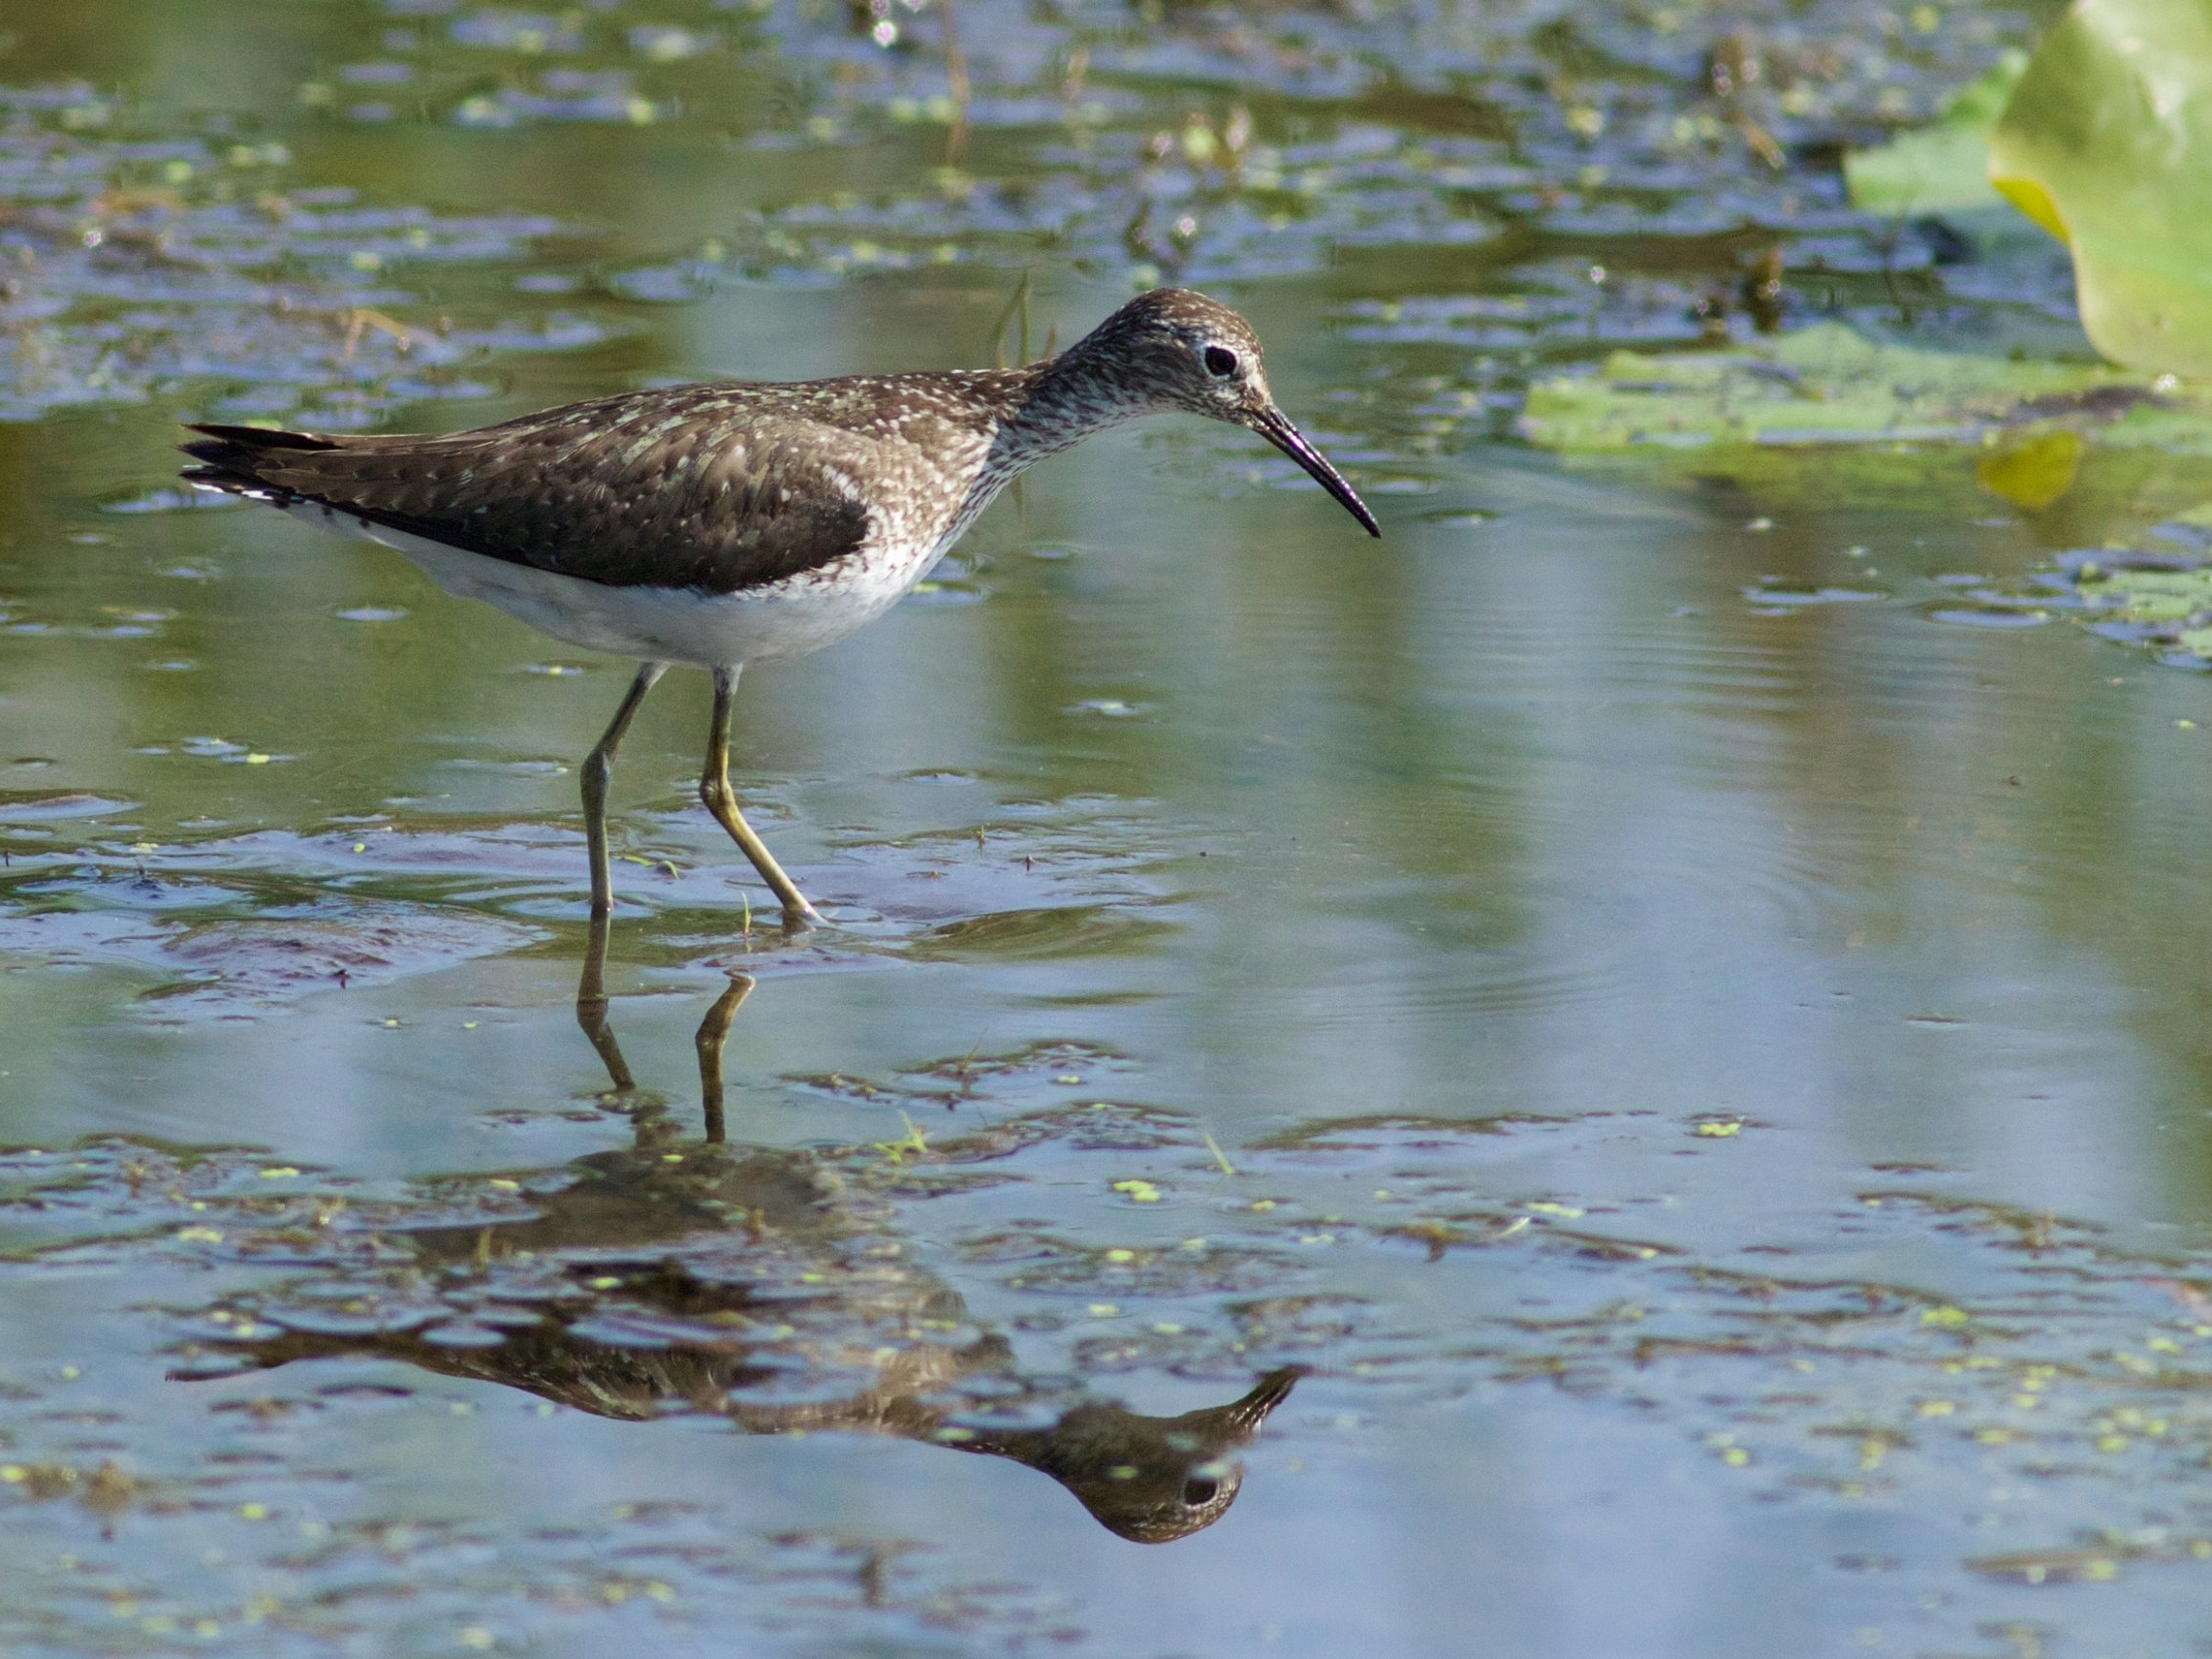 Lesser yellowlegs in Goose Pond. Photo by Arlene Koziol